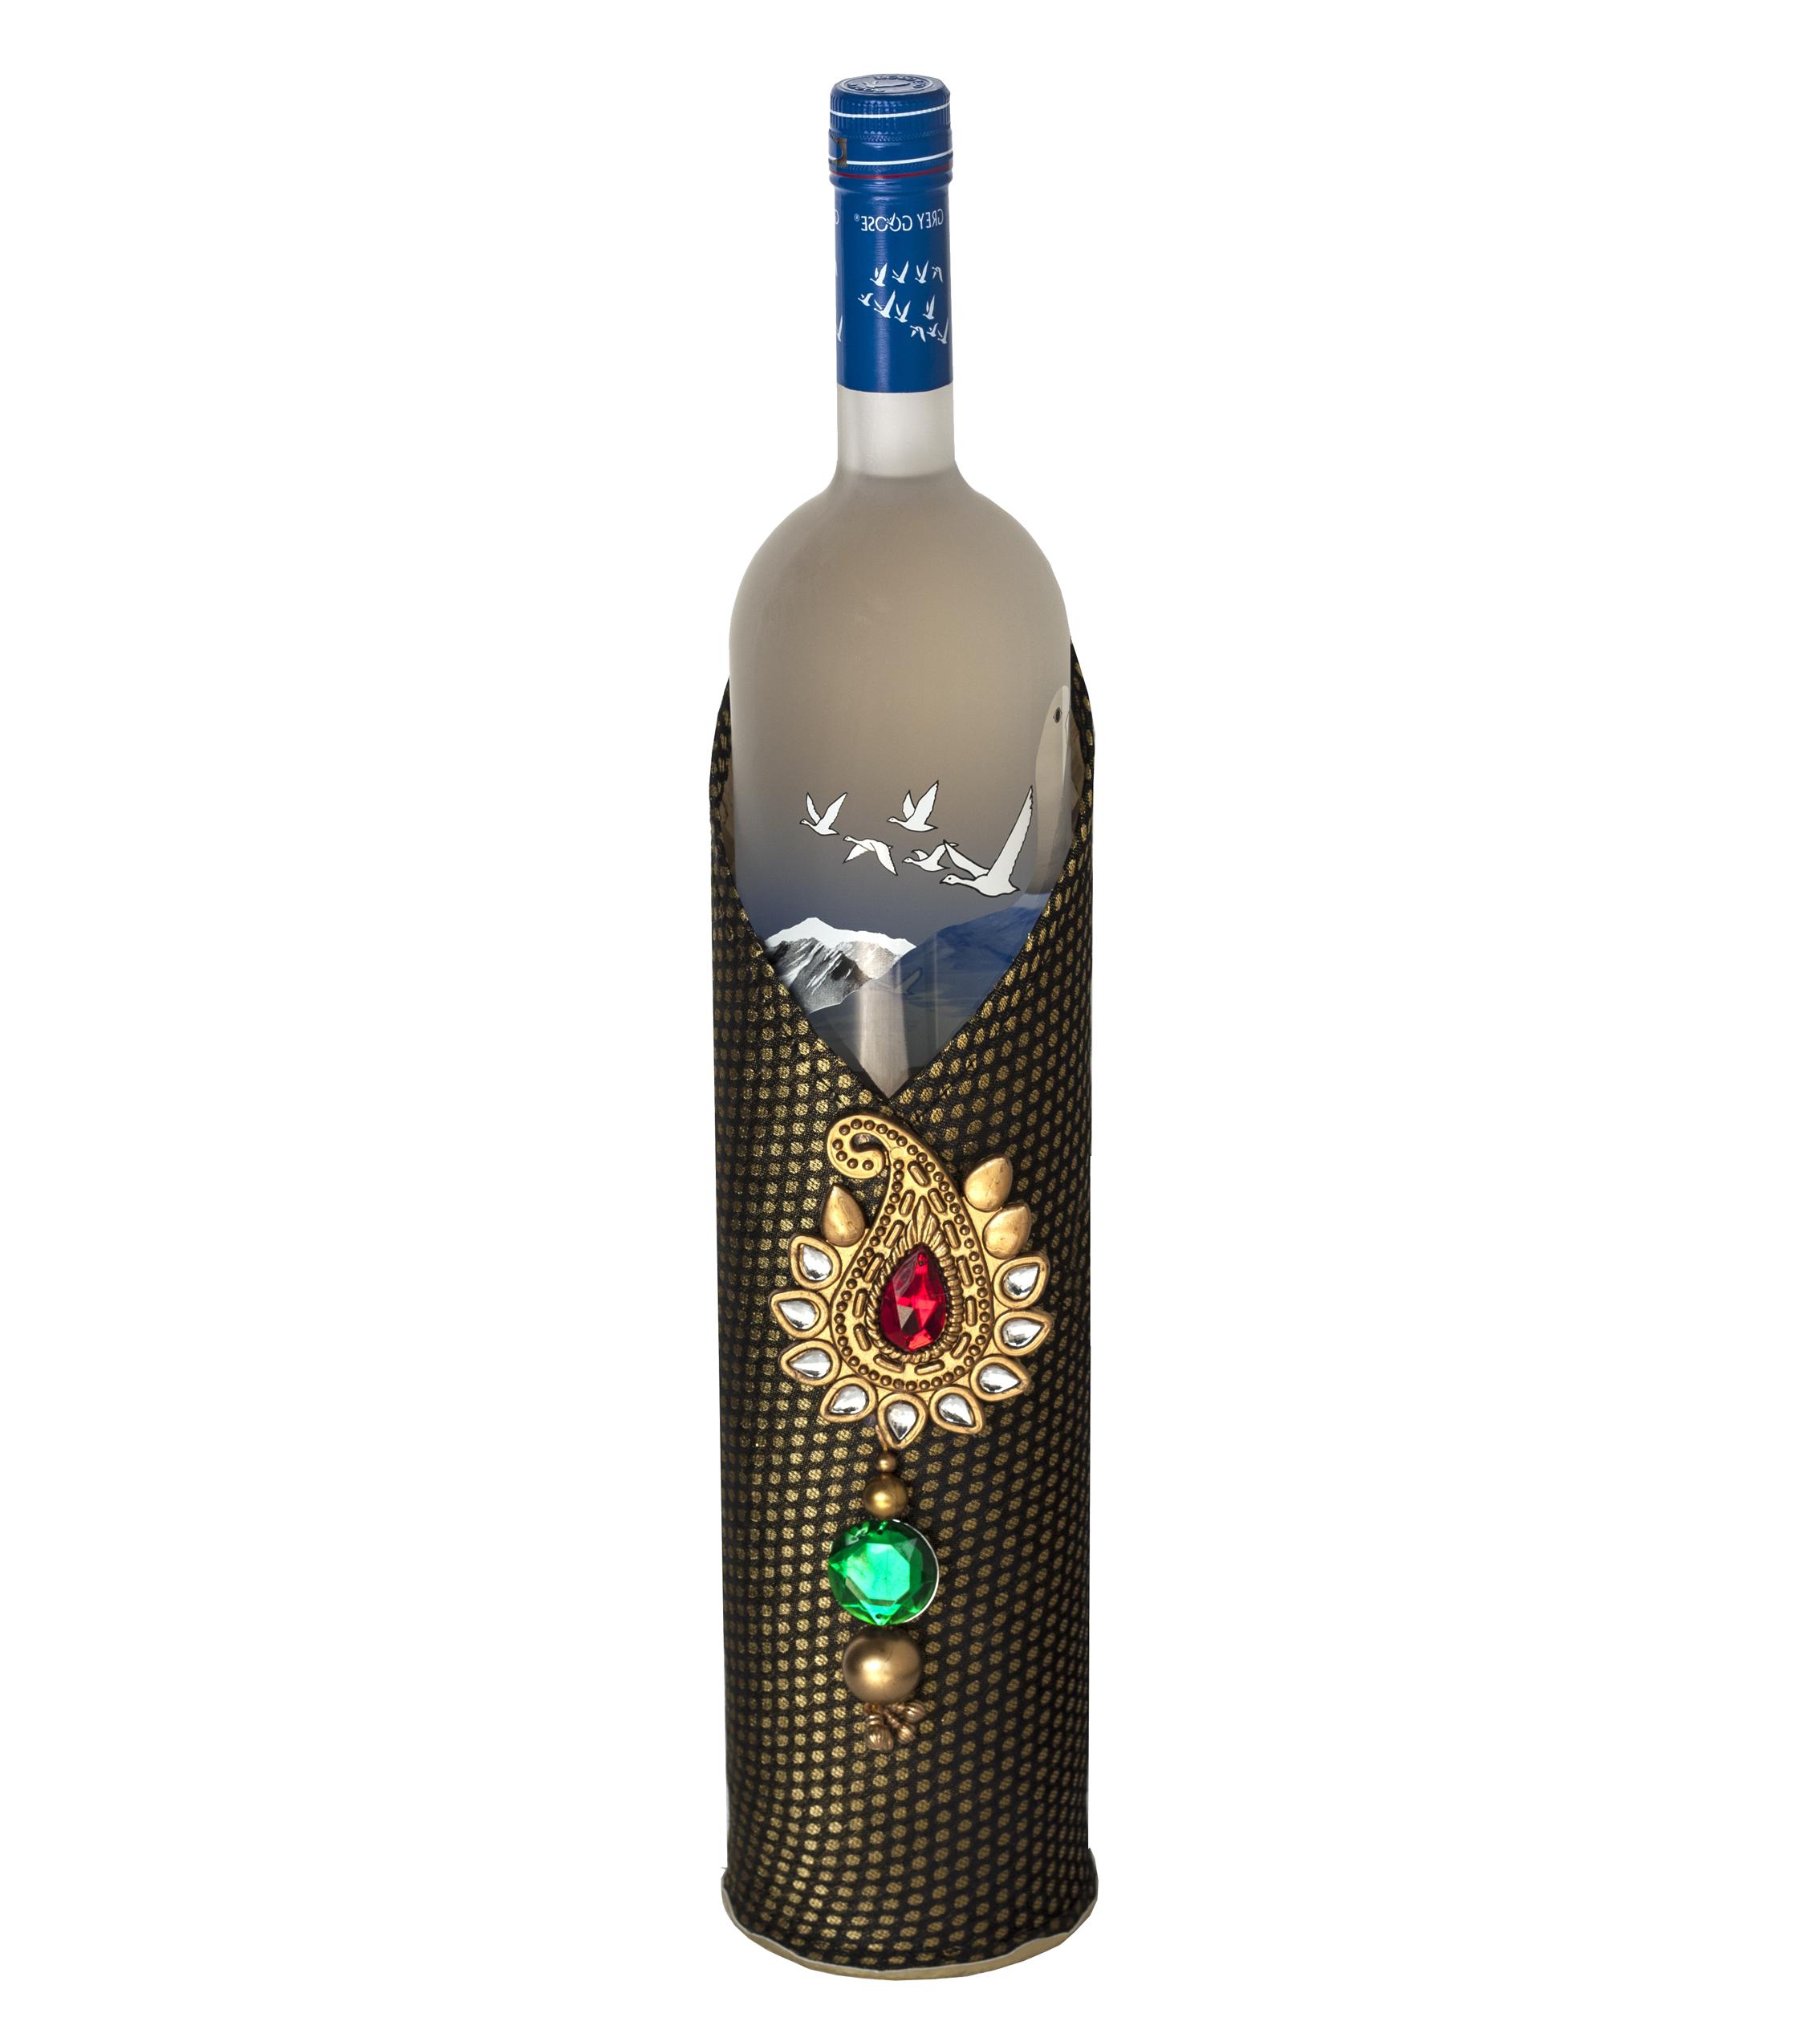 Wine image purepng free. Liquor bottle png